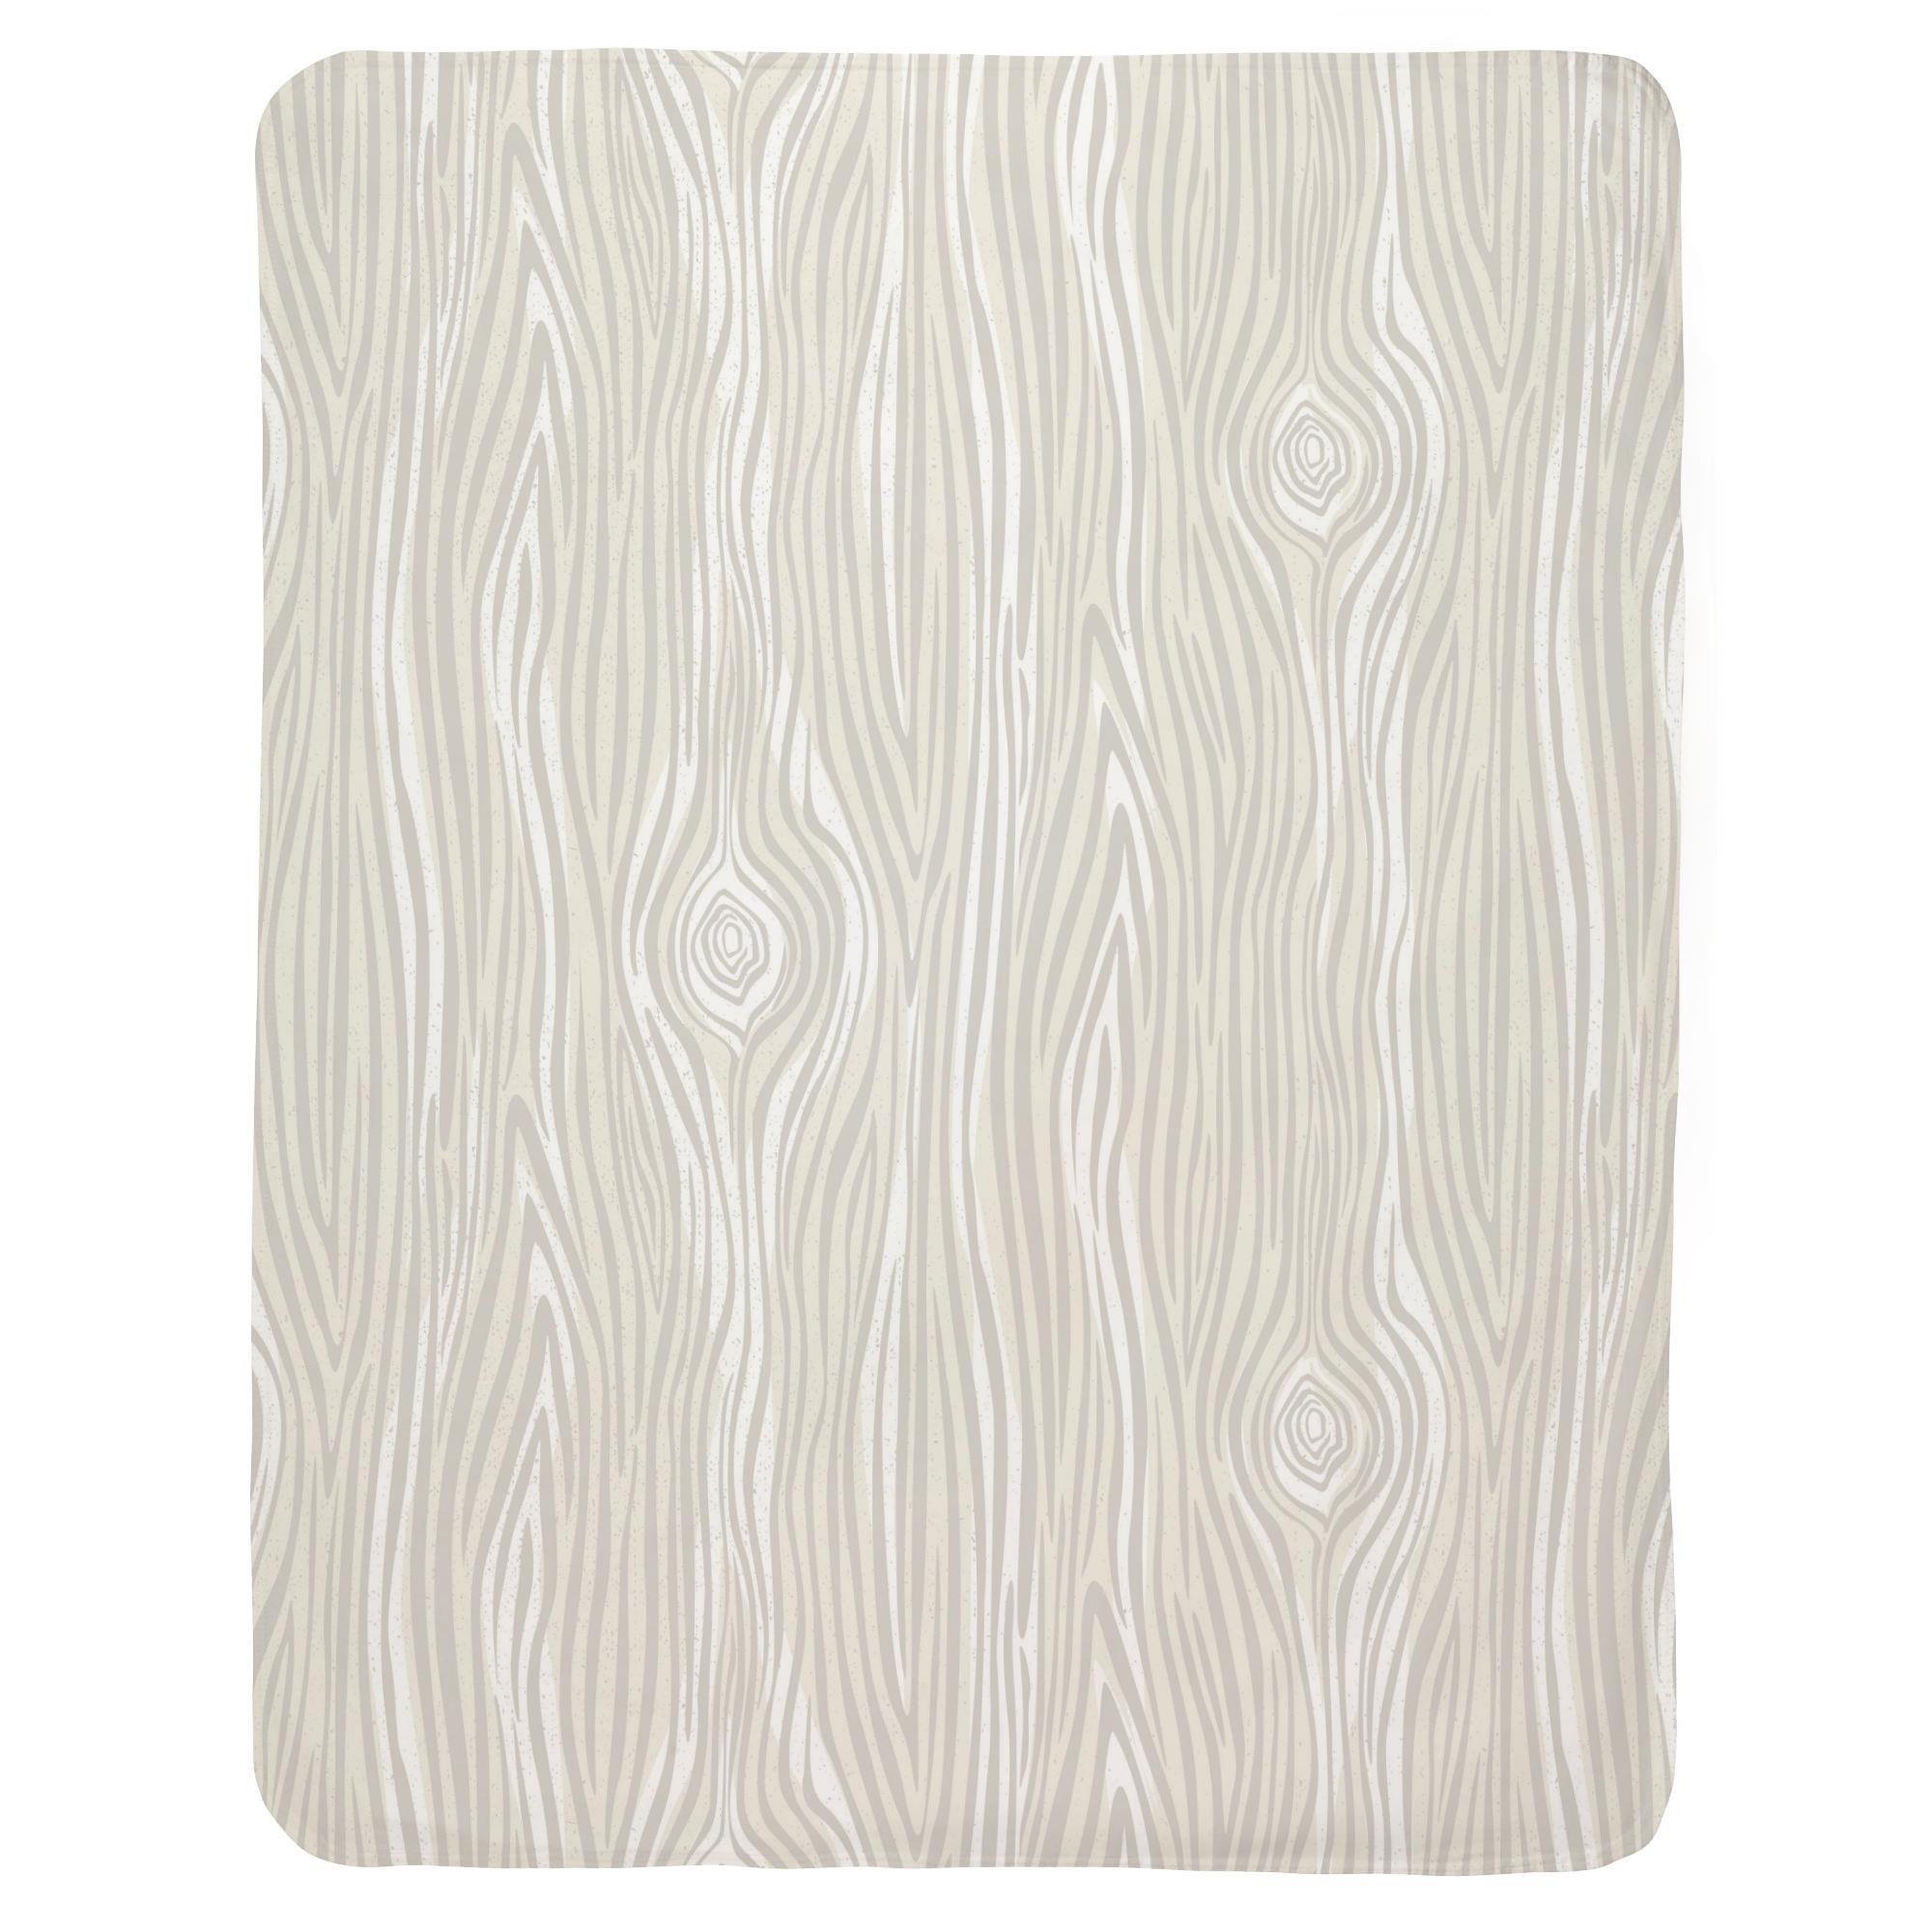 Carousel Designs French Gray Large Woodgrain Mini Crib Blanket by Carousel Designs (Image #2)